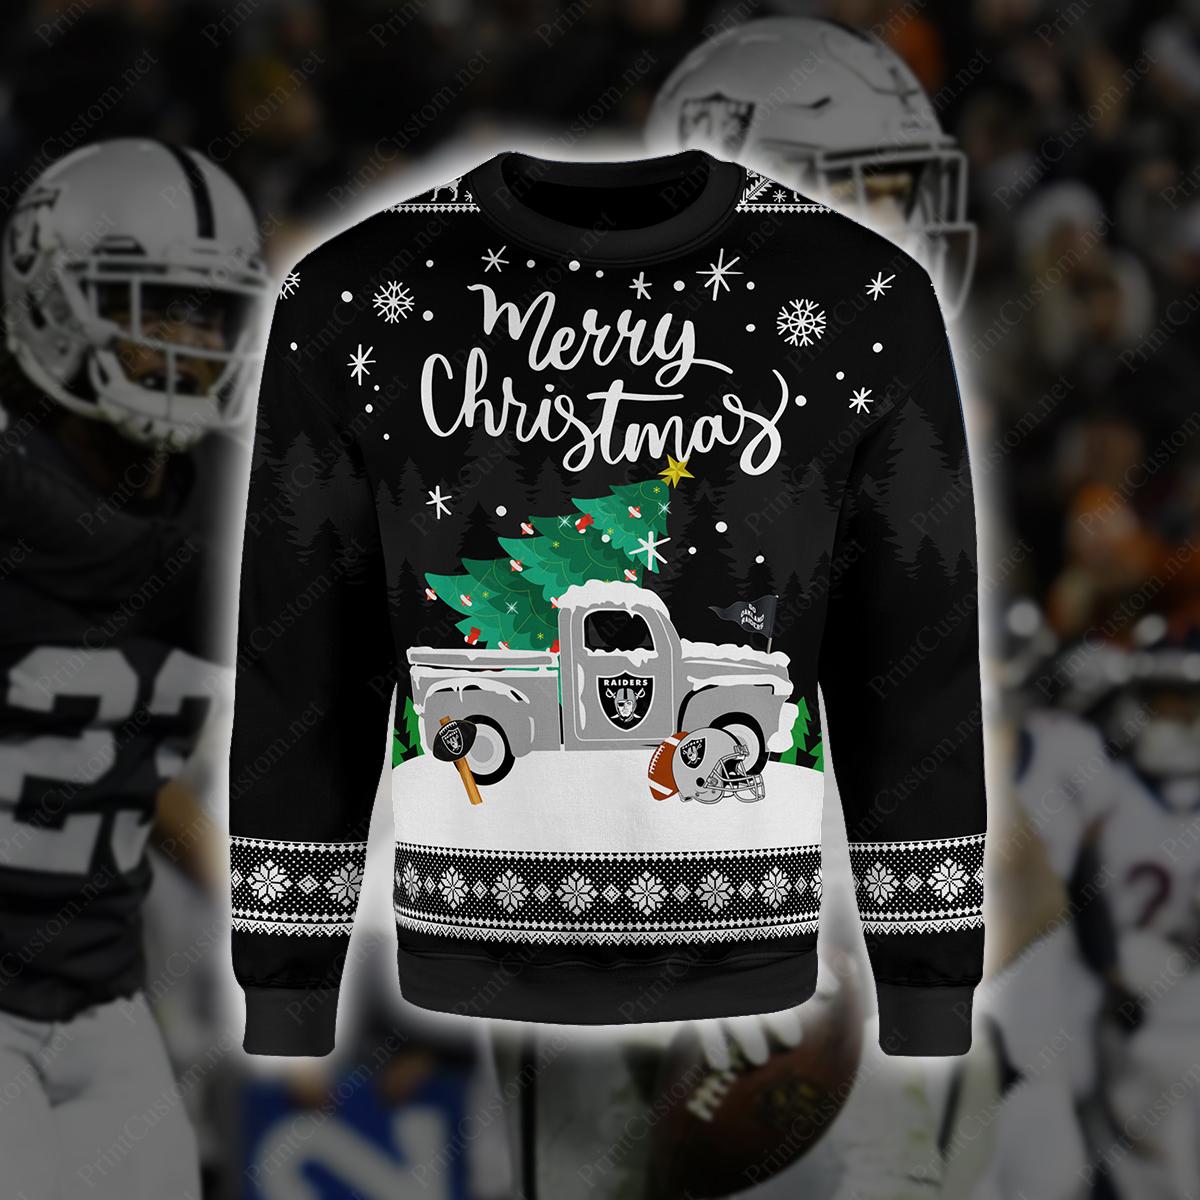 Merry christmas oakland raiders full printing sweatshirt